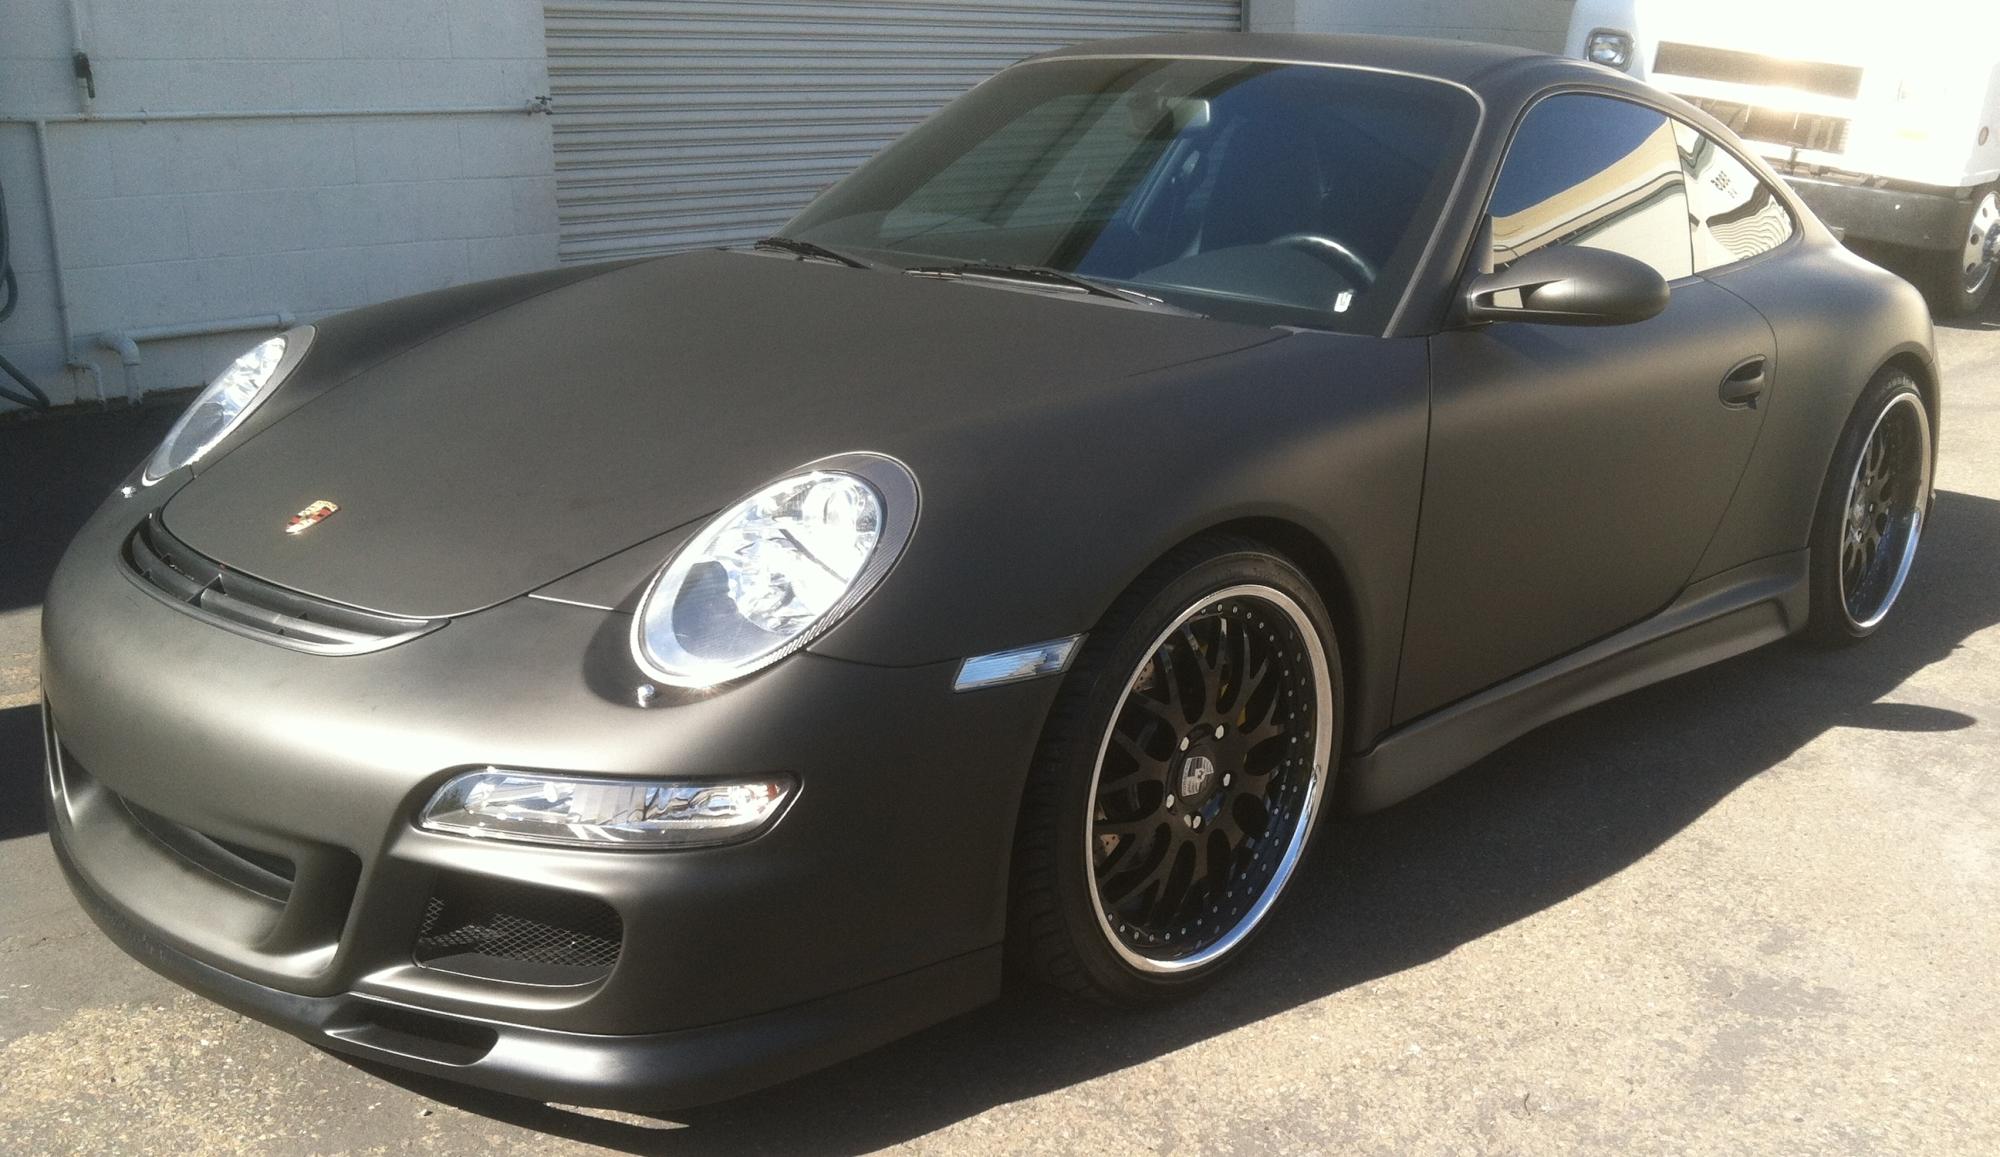 Porsche Matte Black Car Wrap 01